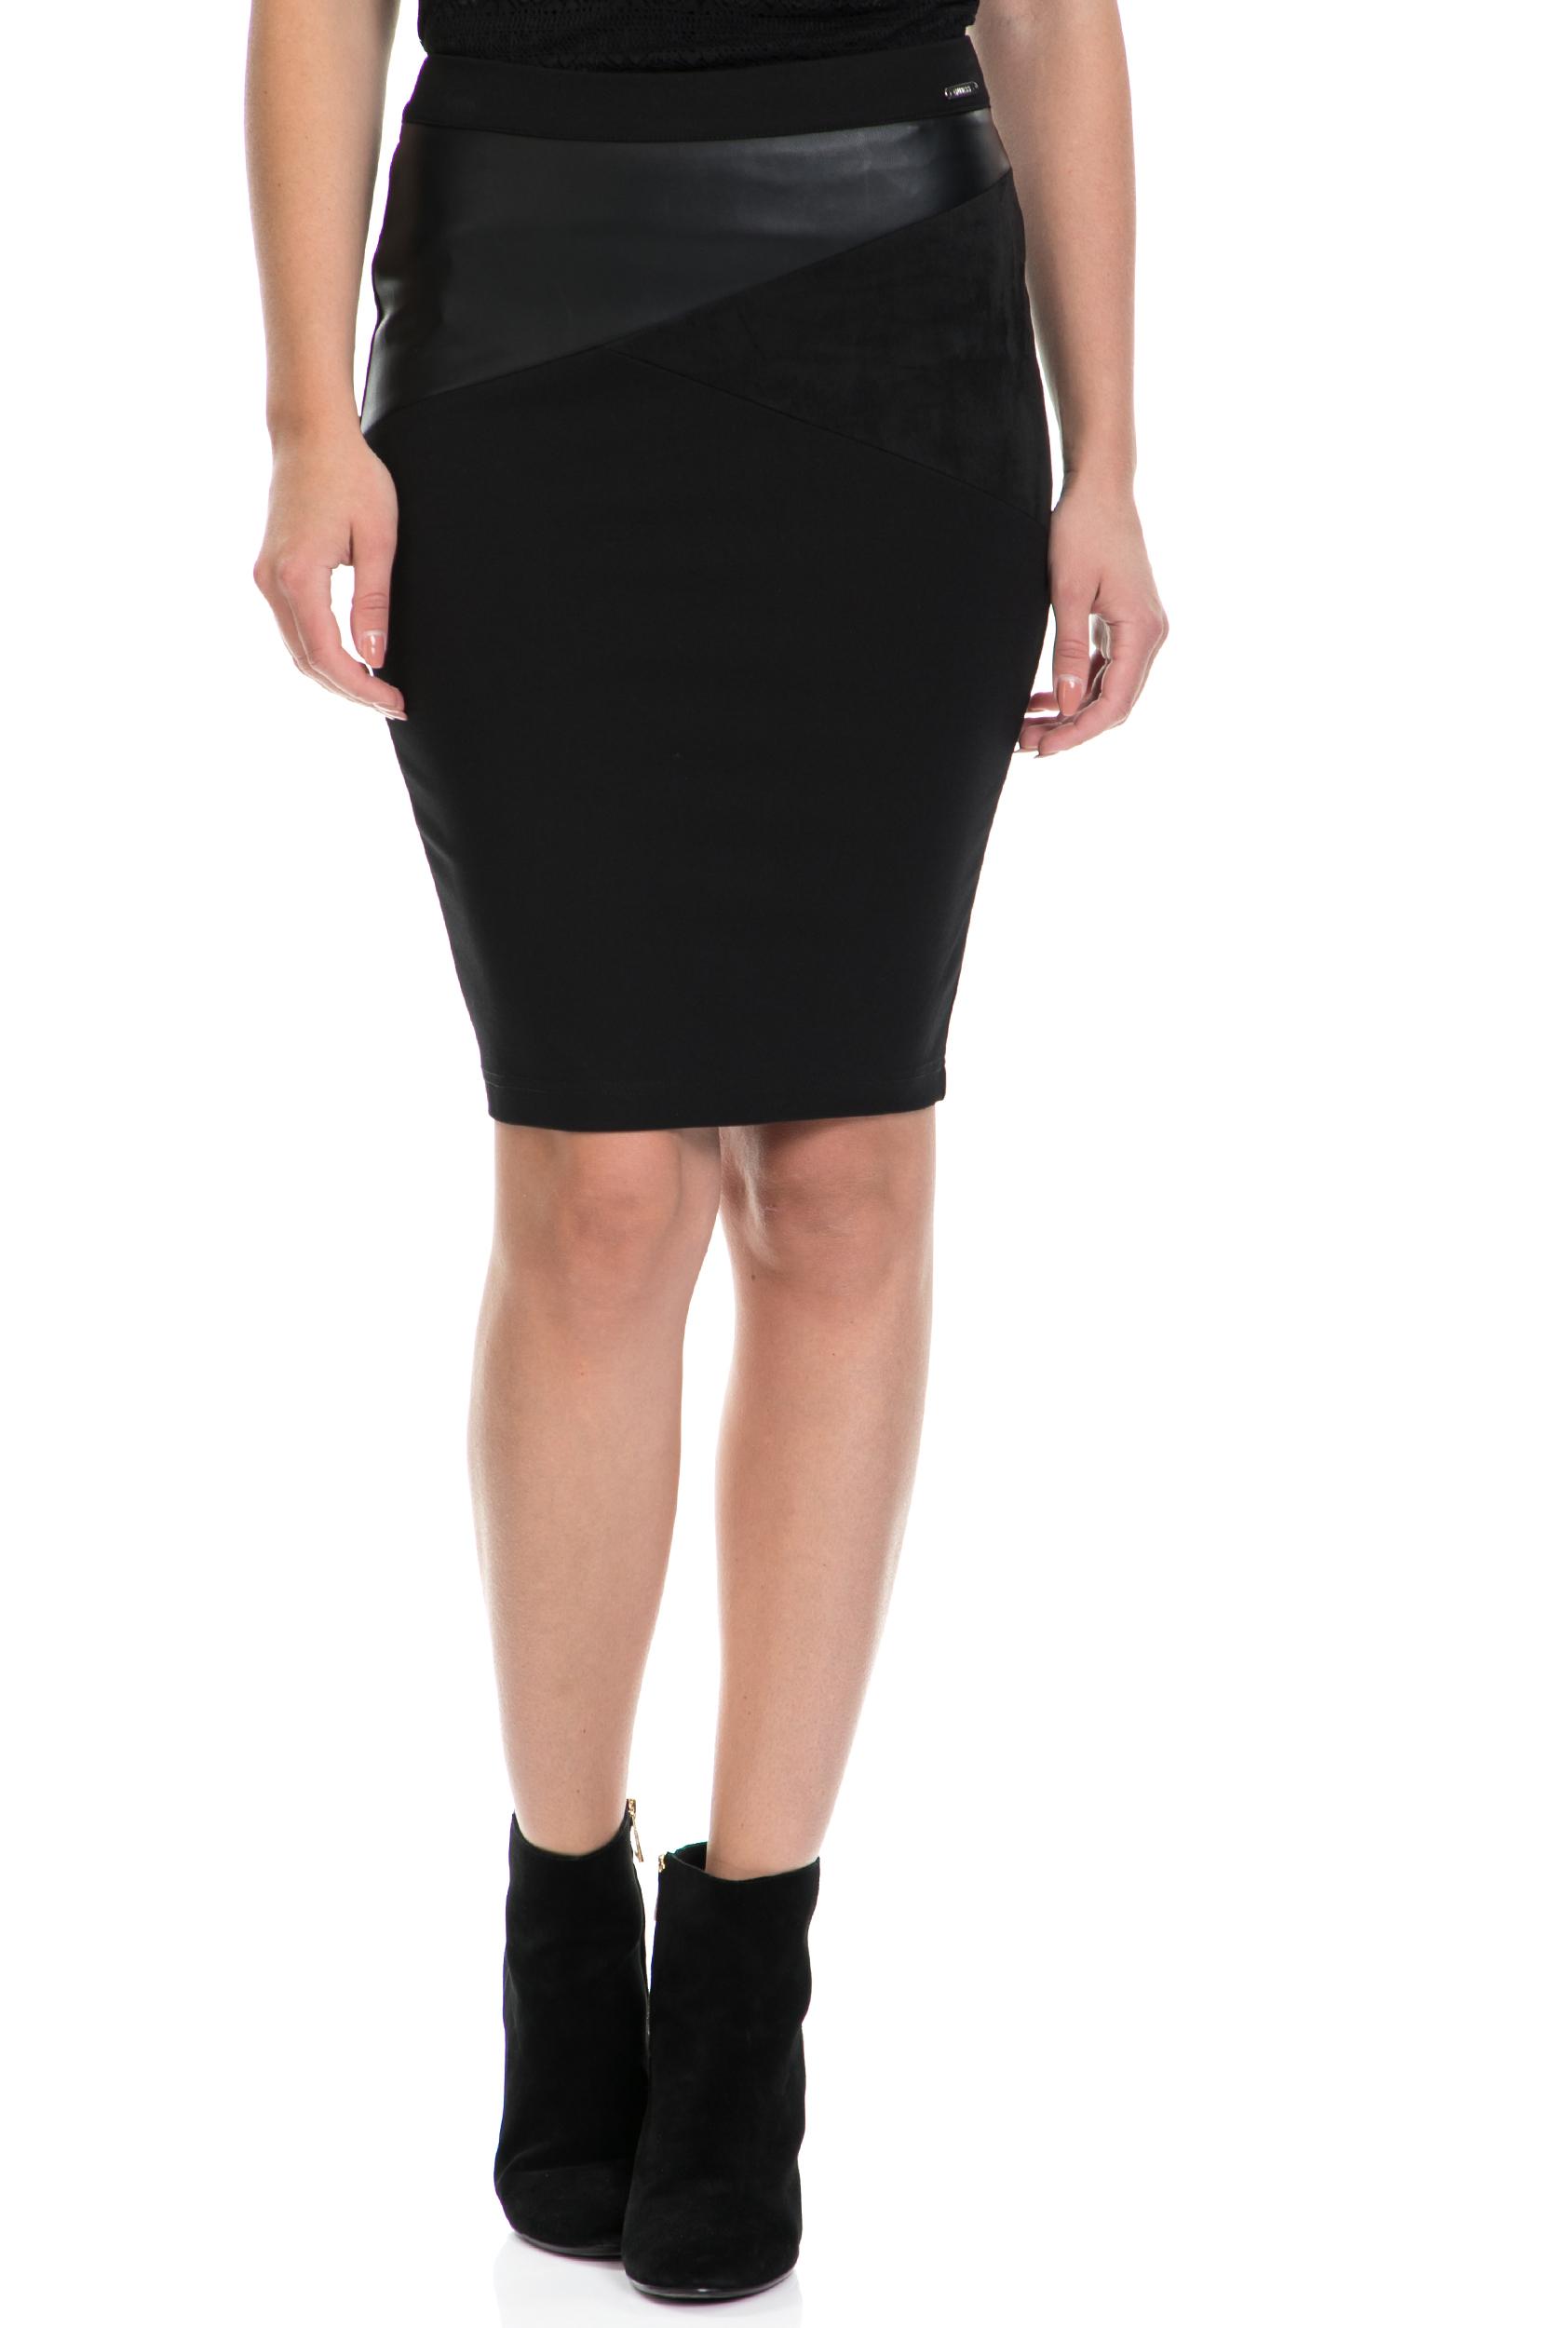 GUESS – Γυναικεία φούστα AMBRA GUESS μαύρη